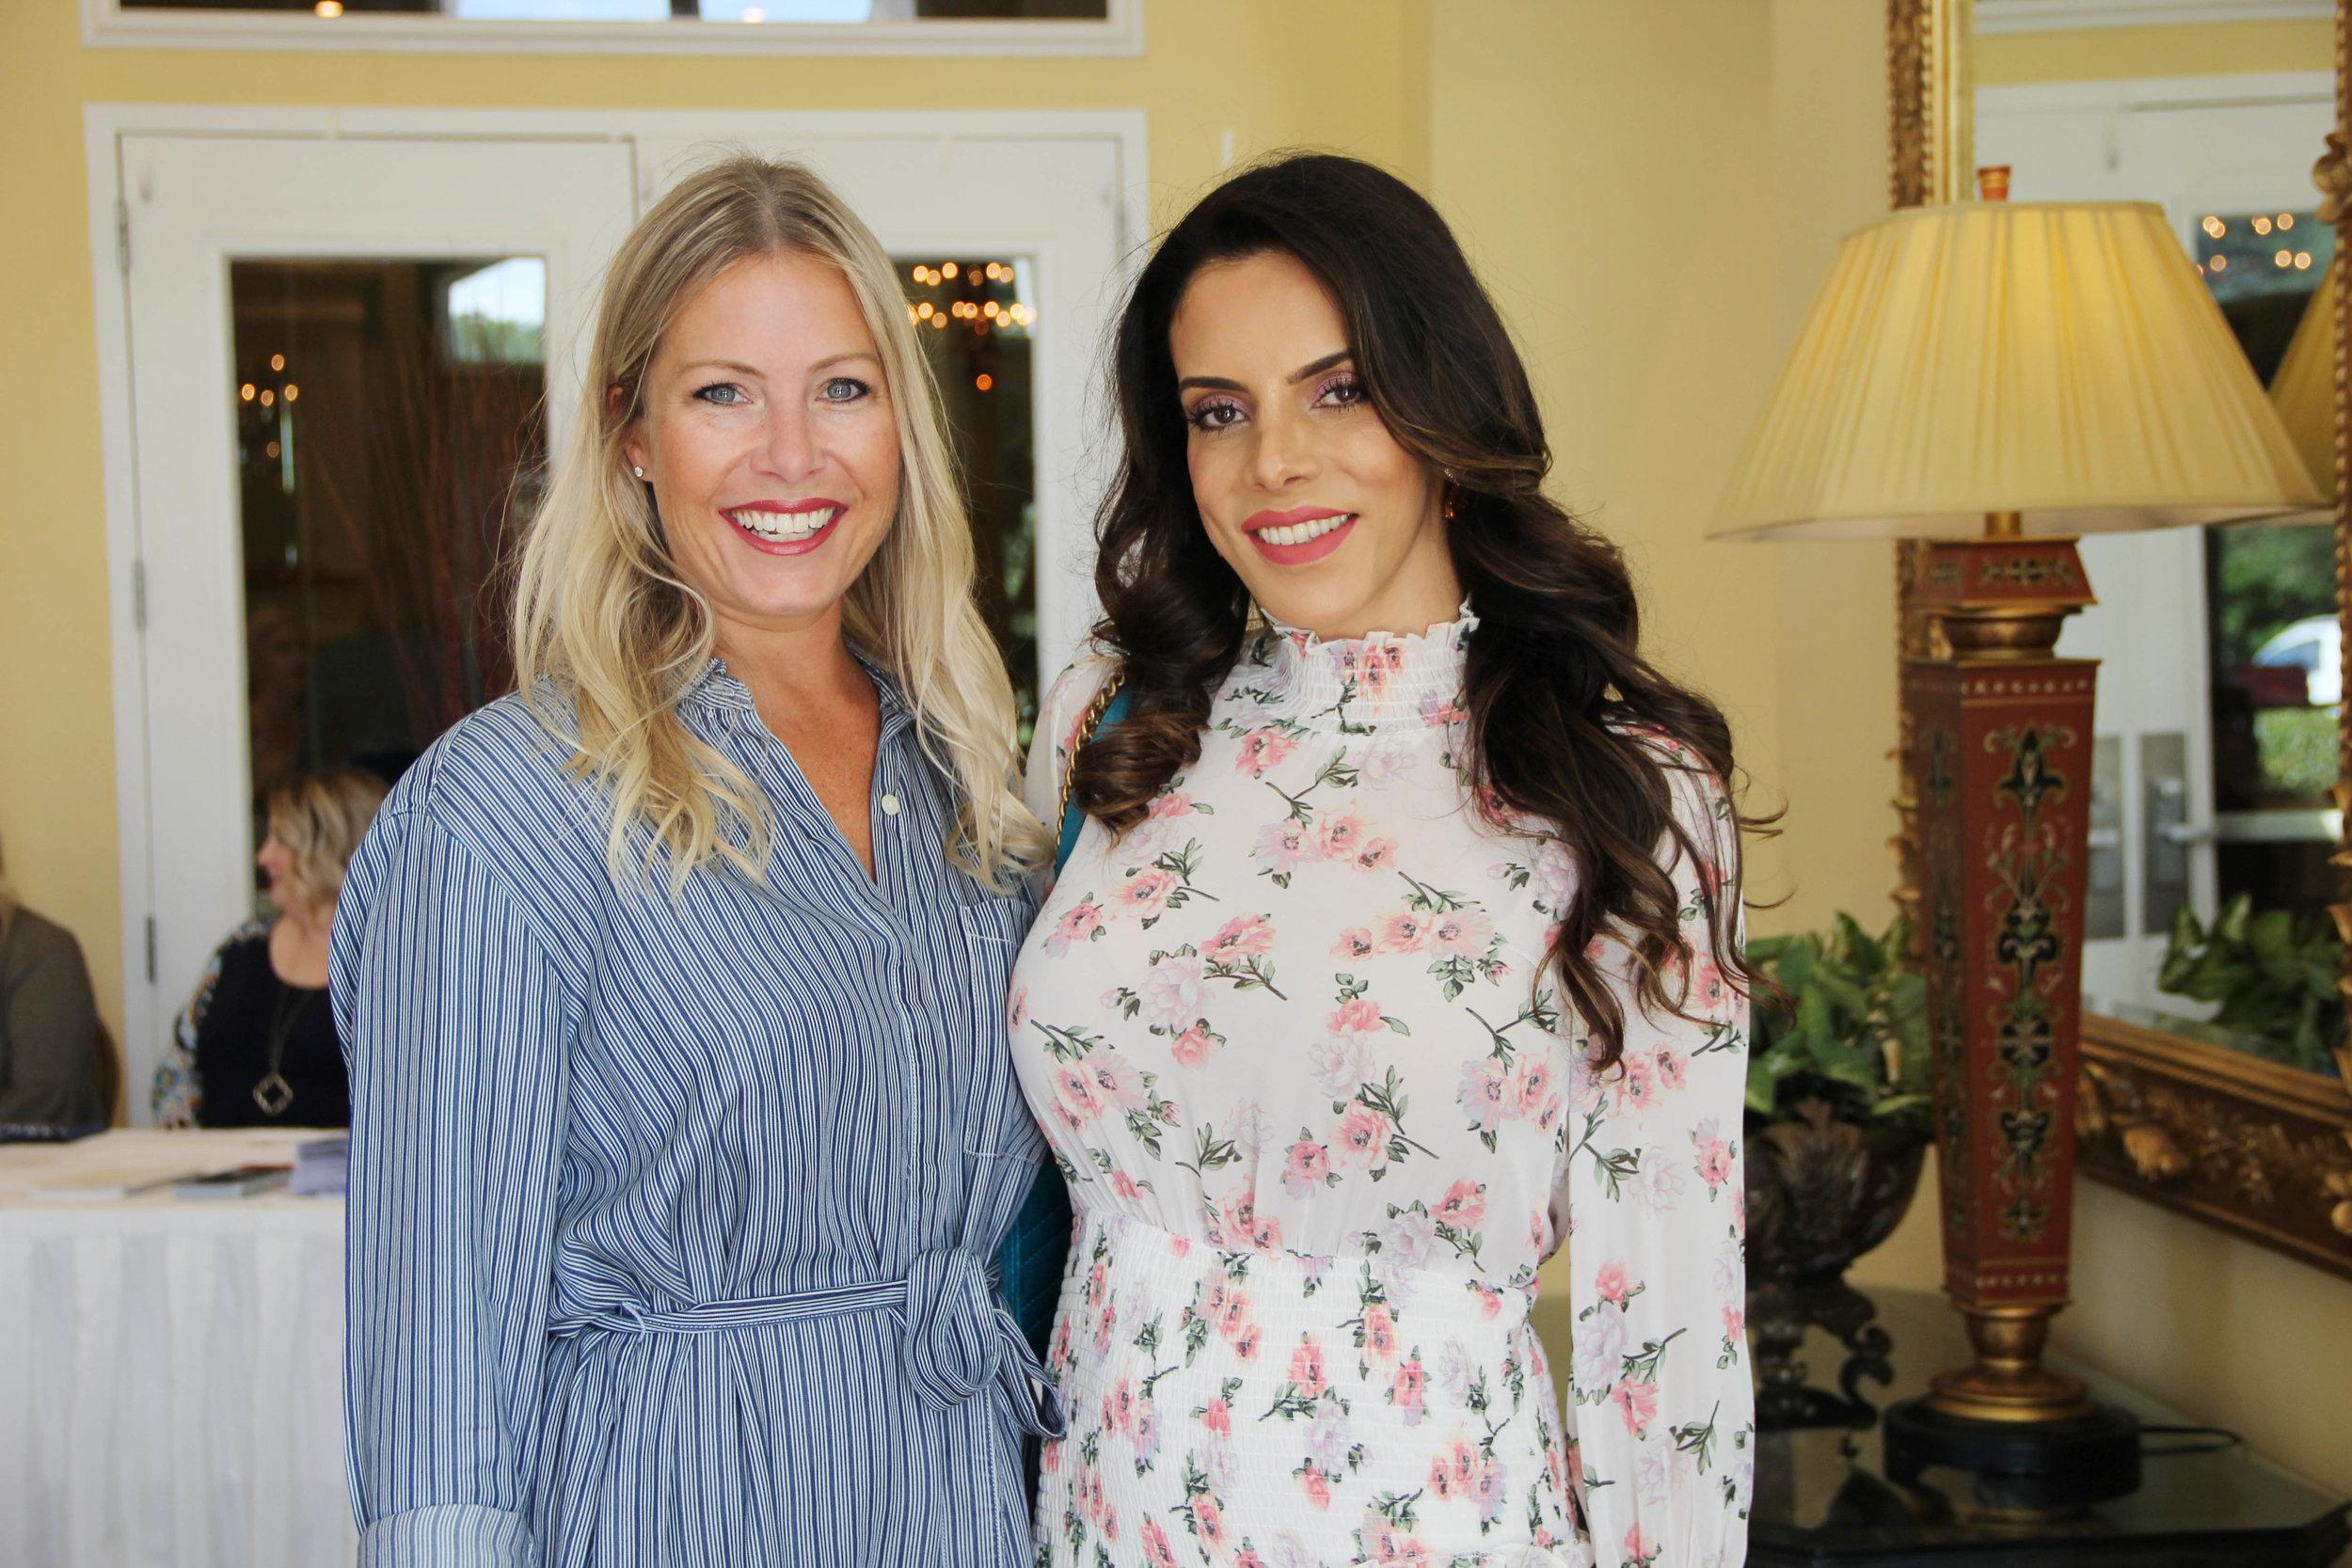 Whitney Fuqua and Layla Hazin